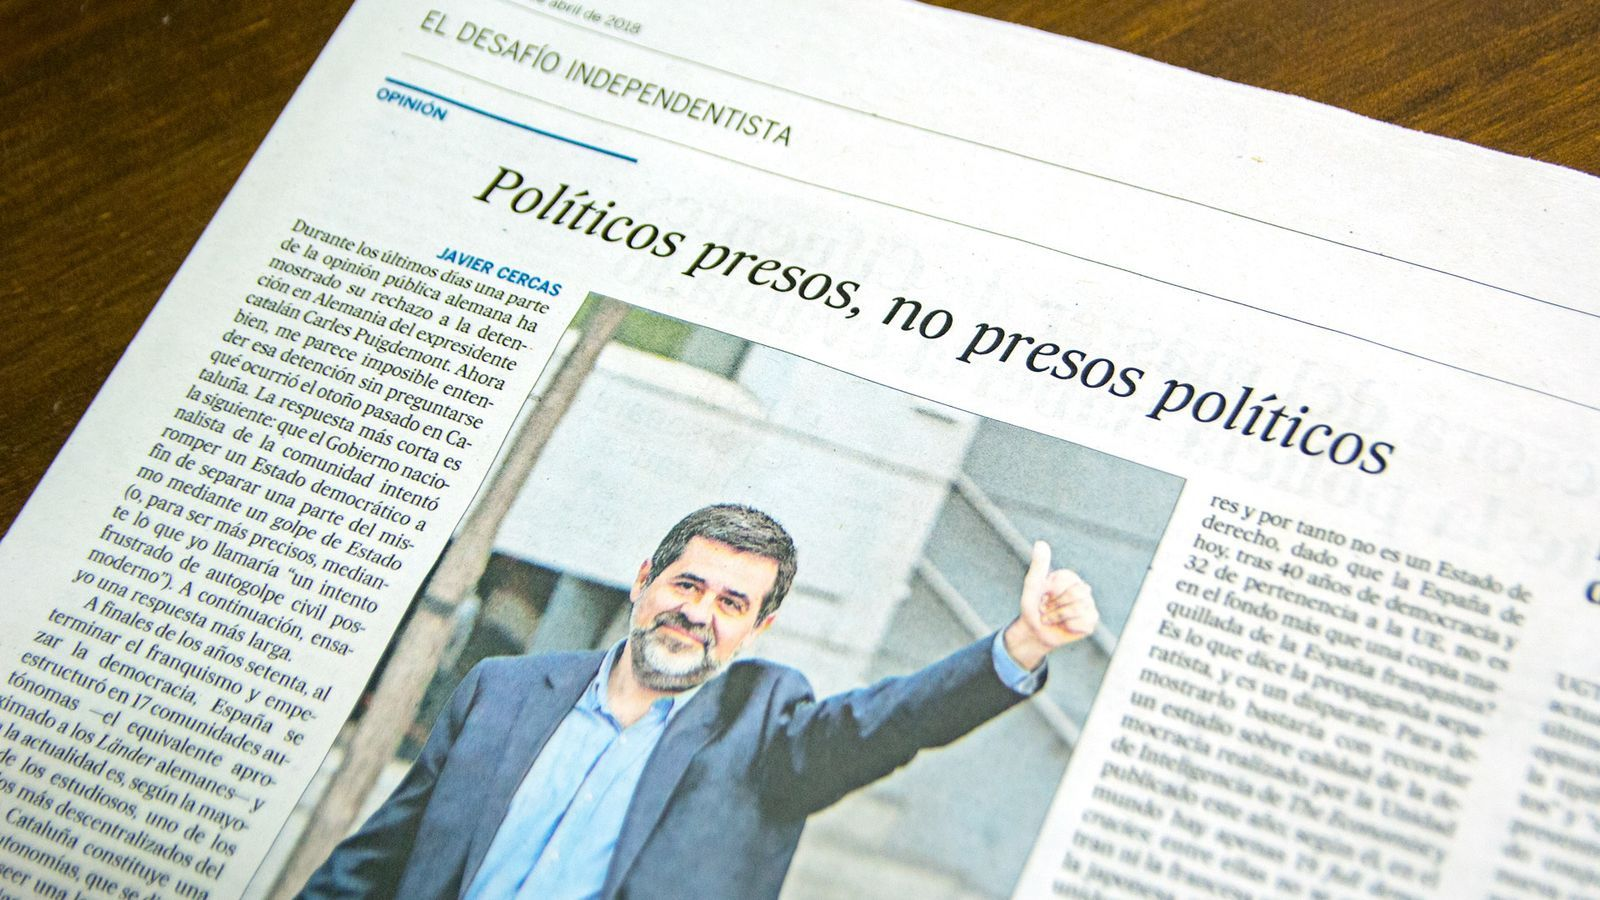 L'anàlisi d'Antoni Bassas: 'Una resposta cordial a Javier Cercas'